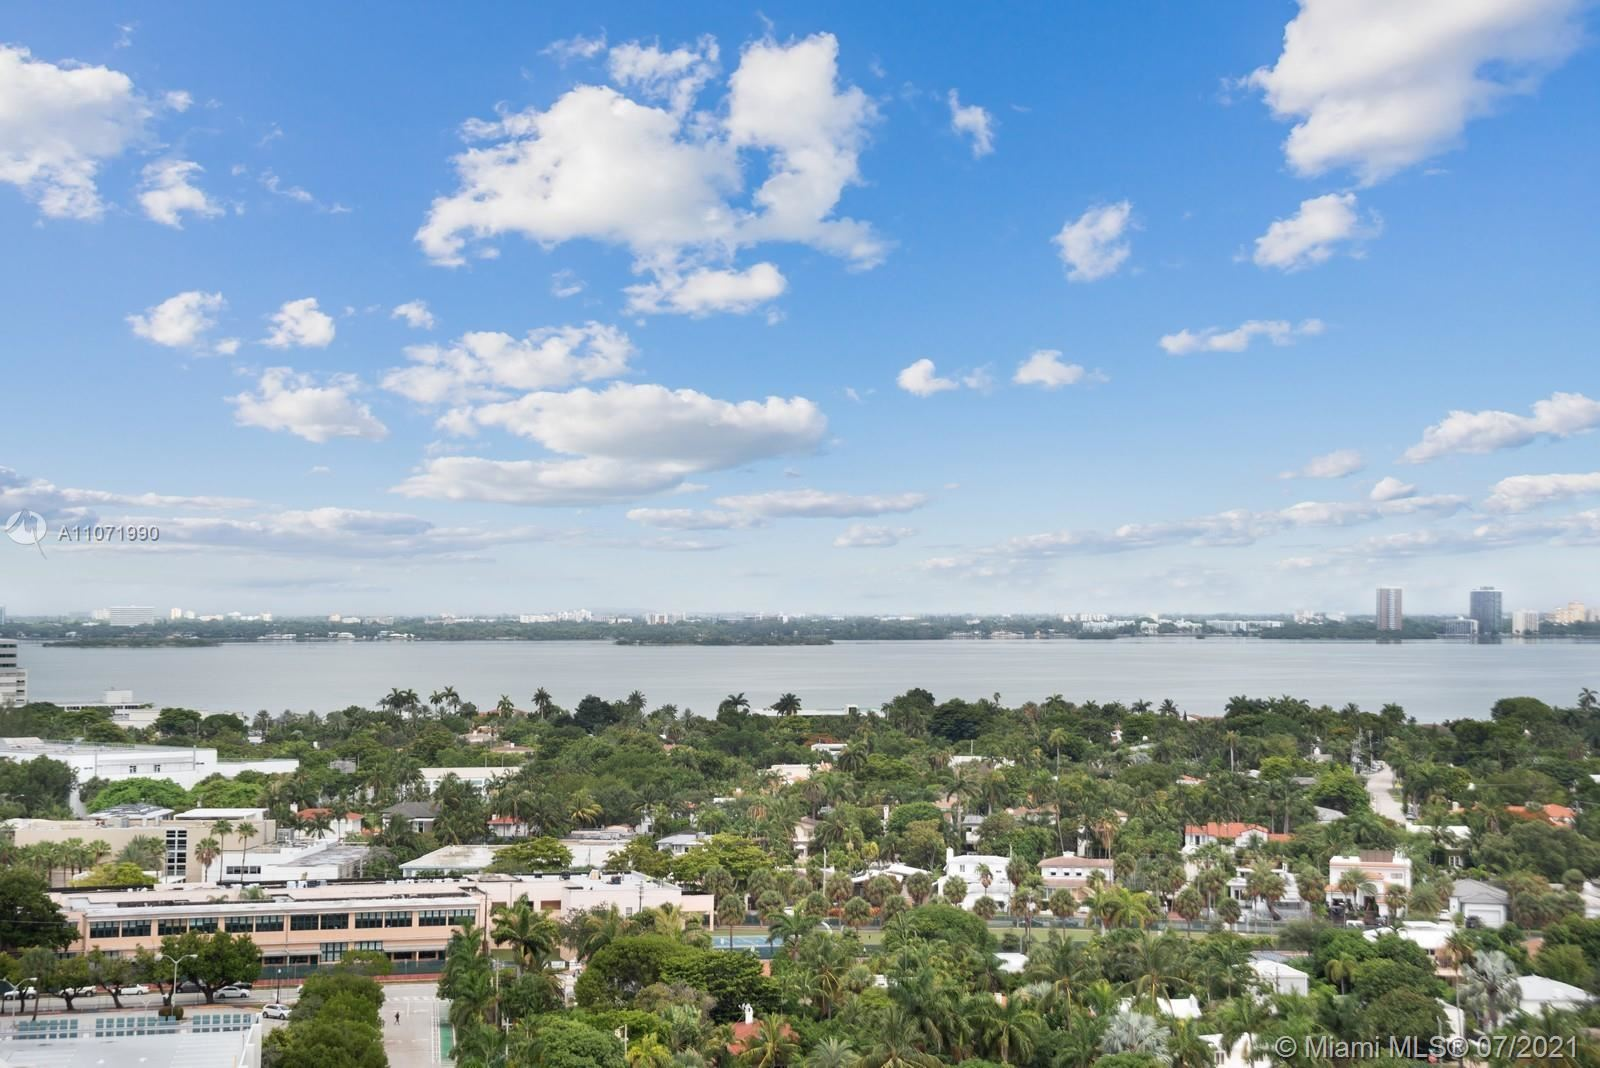 4101 Pine Tree Dr #1802, Miami Beach, FL 33140 - #: A11071990